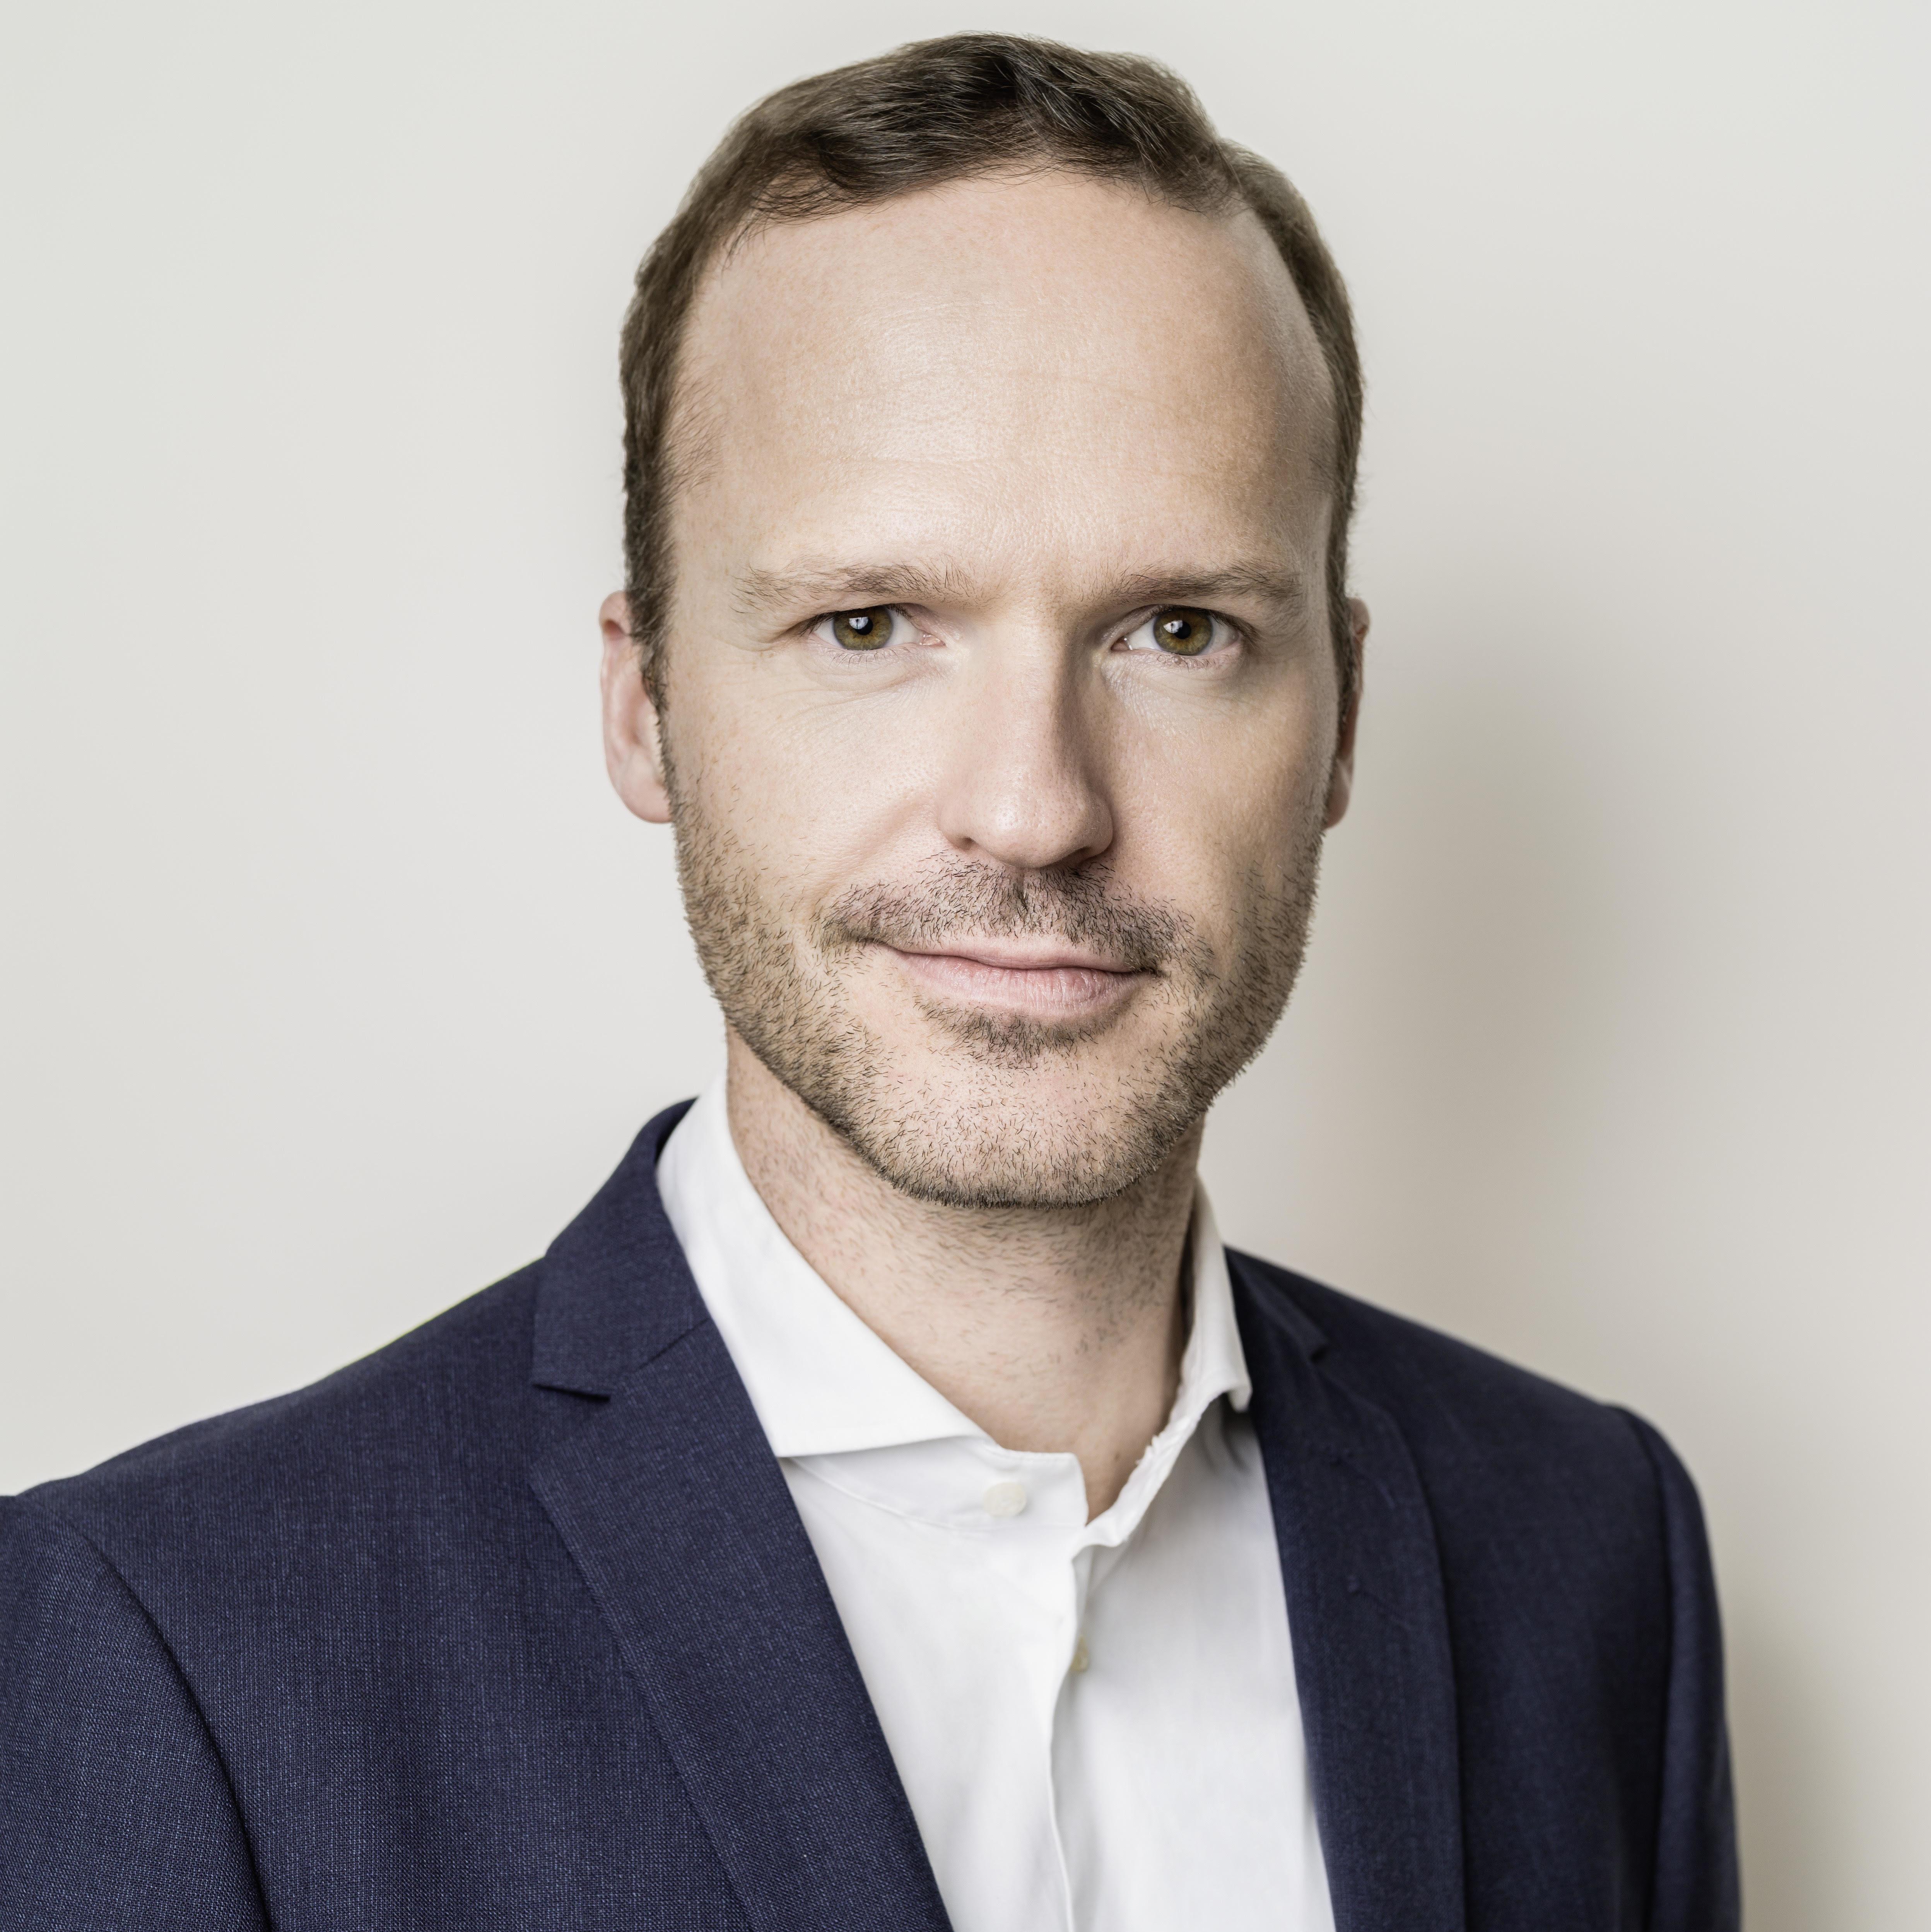 https://www.startplatz.de/prof-dr-reinhard-meier-2/